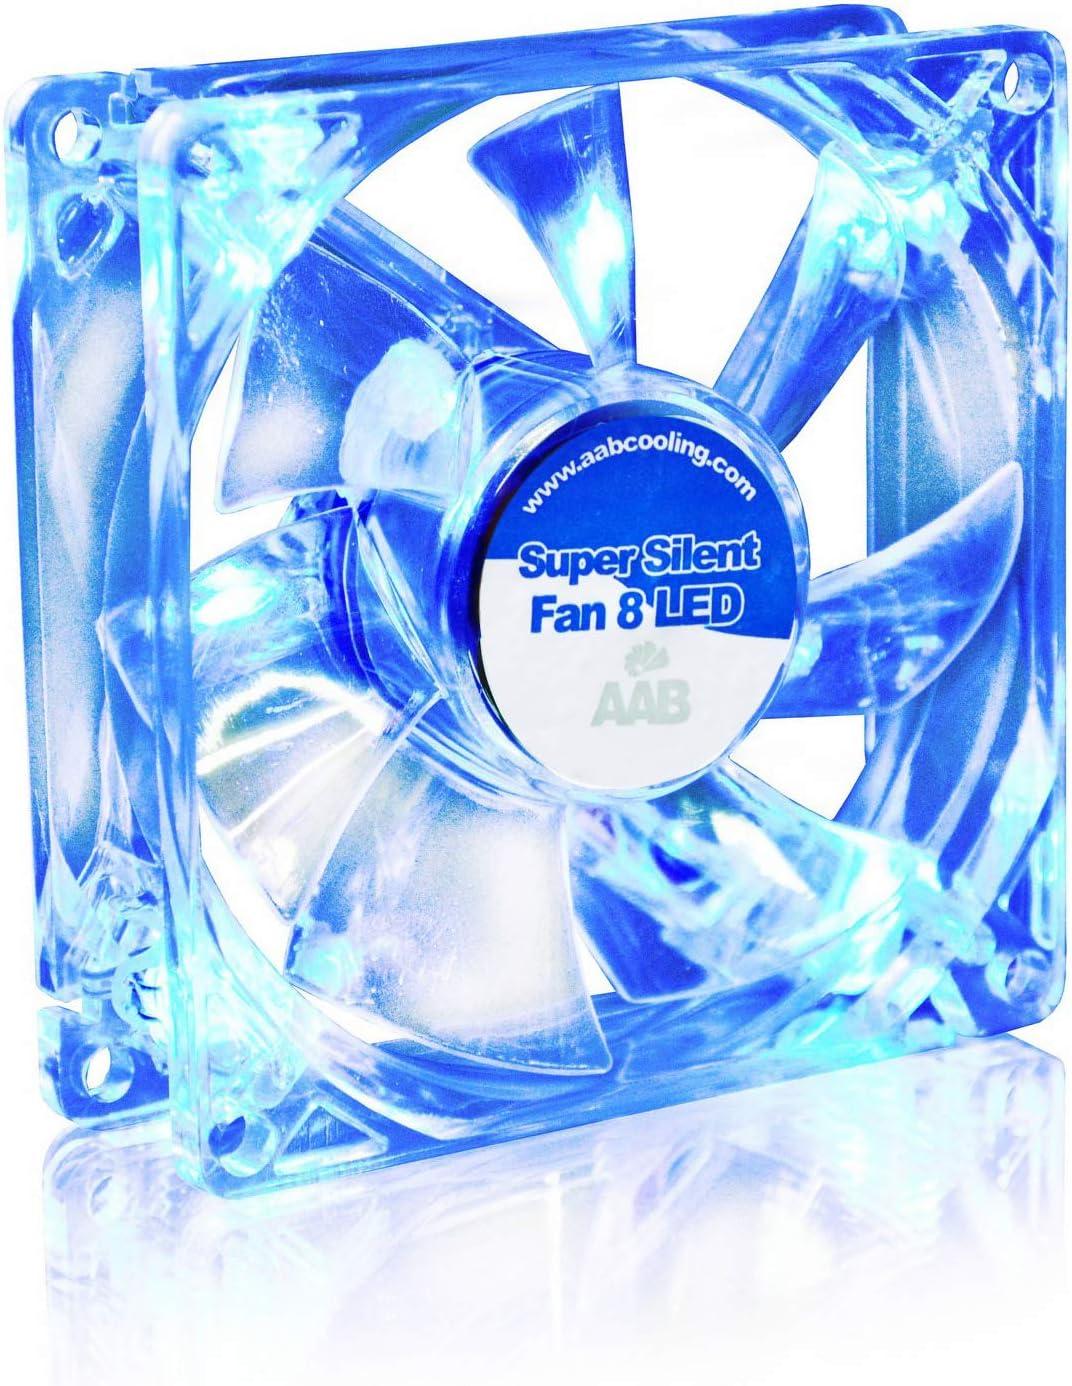 AAB Raffreddamento SUPER SILENT FAN 9 LED blu-e 92mm,